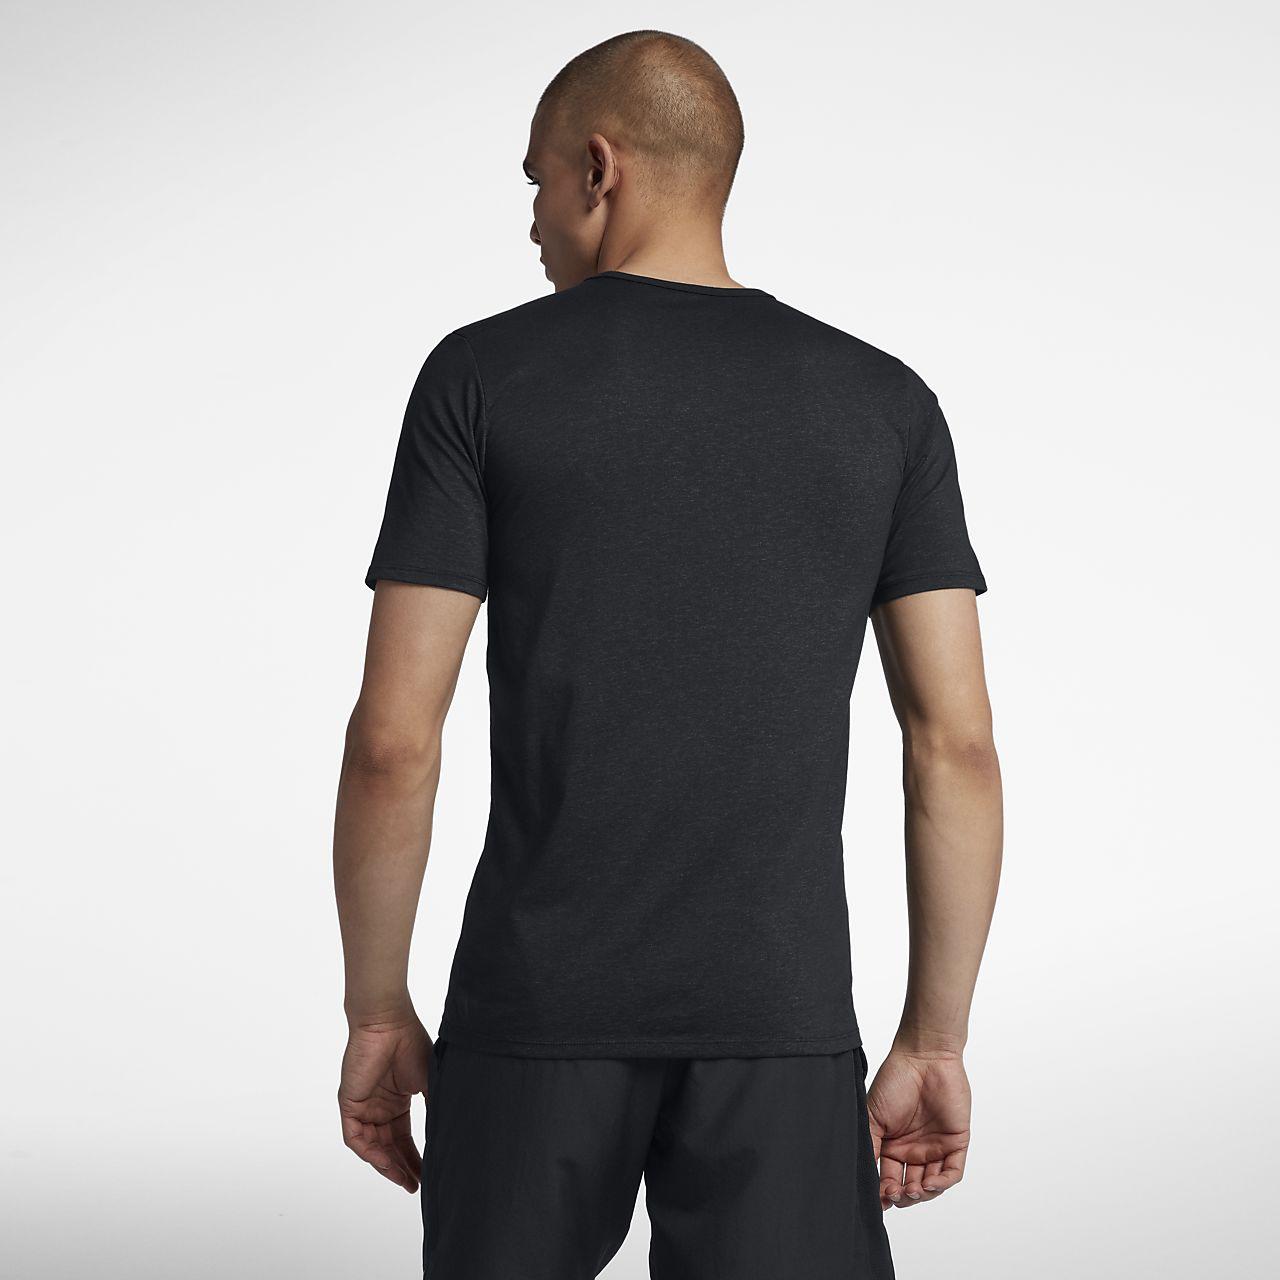 Mens Running Shirts T Shirts Design Concept